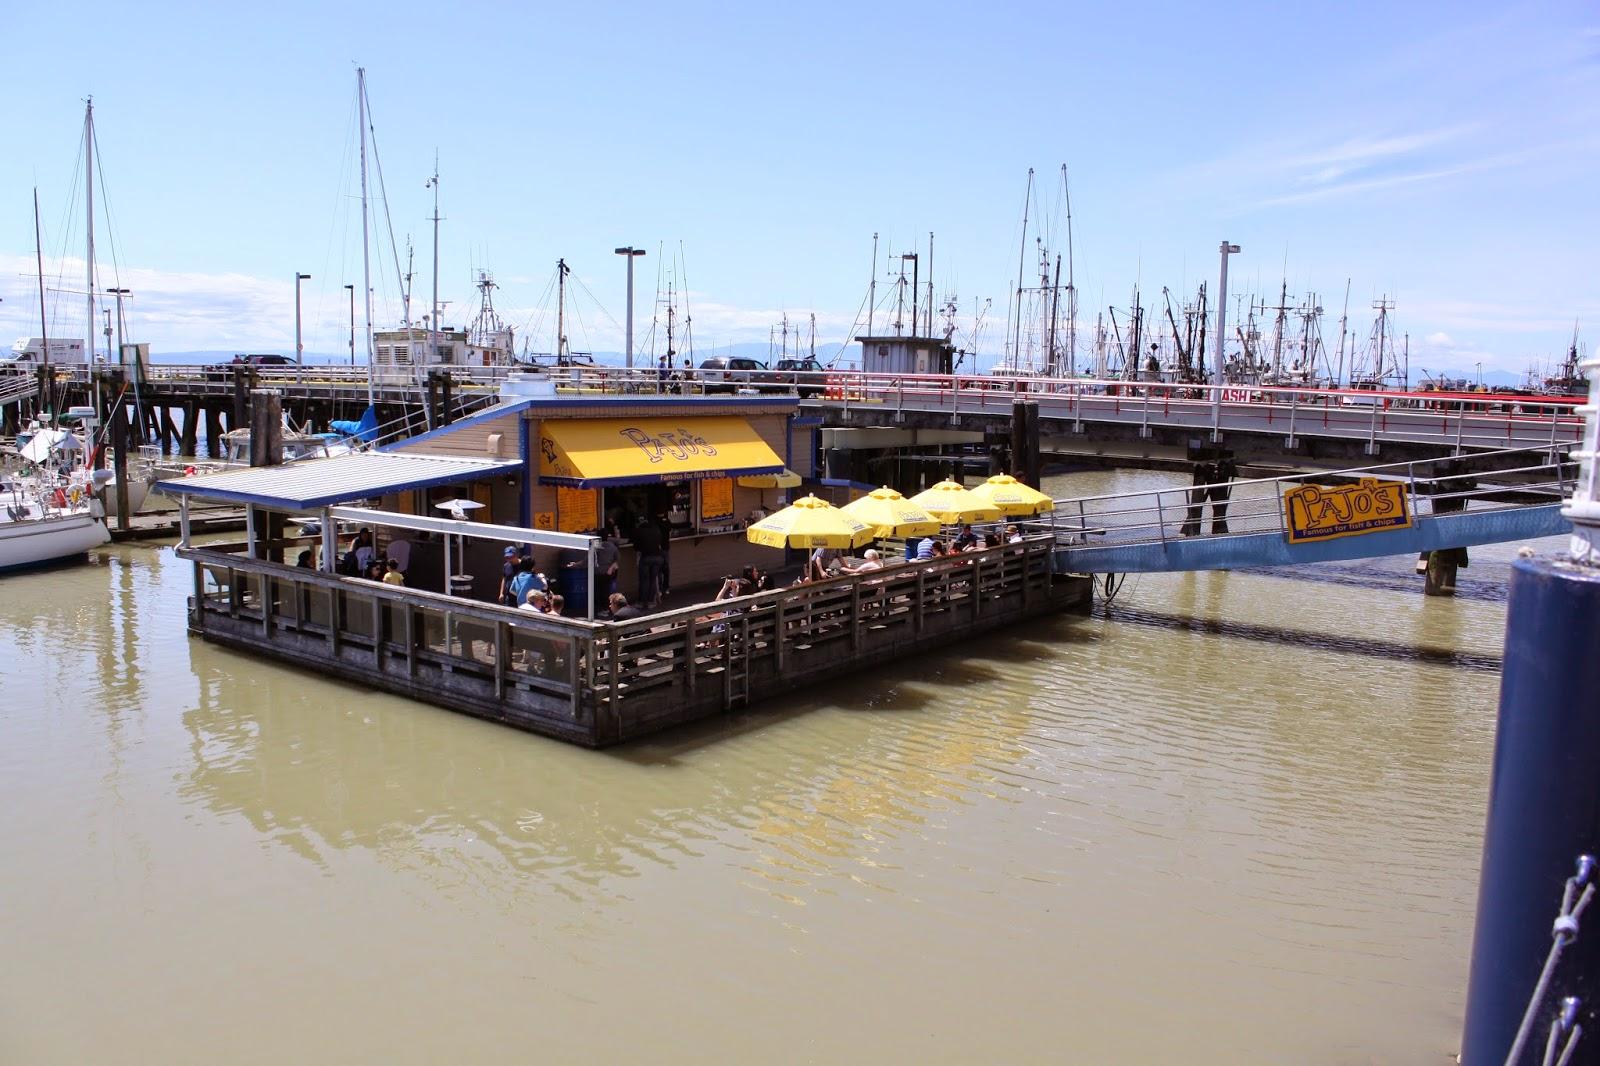 [溫哥華]Waterfront Restaurant Pajo's Fish&Chips 碼頭餐廳Pajo's炸魚薯條 @ KEN的生活日記 :: 痞客邦